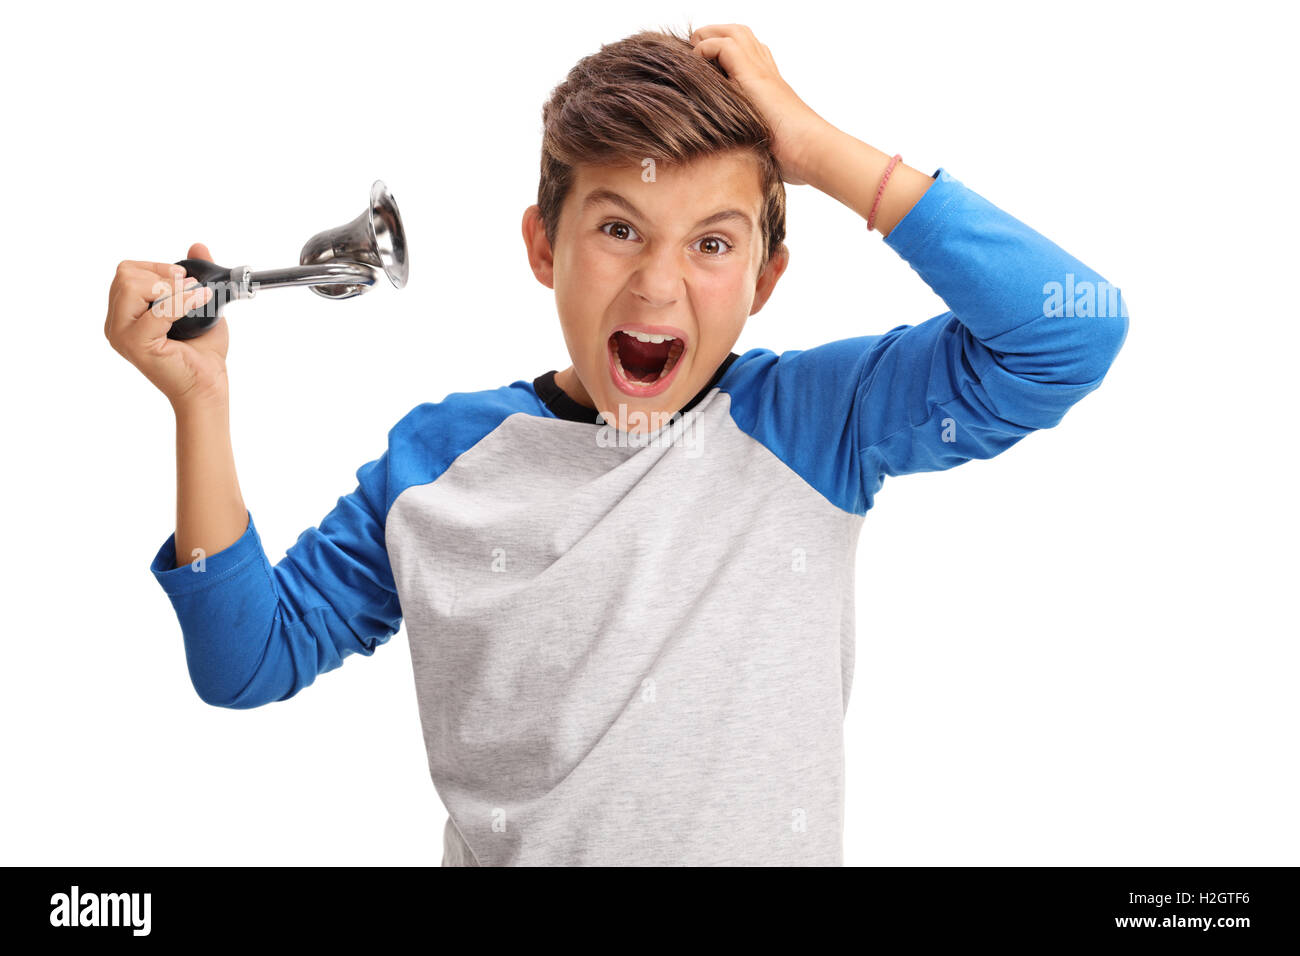 Overjoyed little boy honking a horn isolated on white background - Stock Image